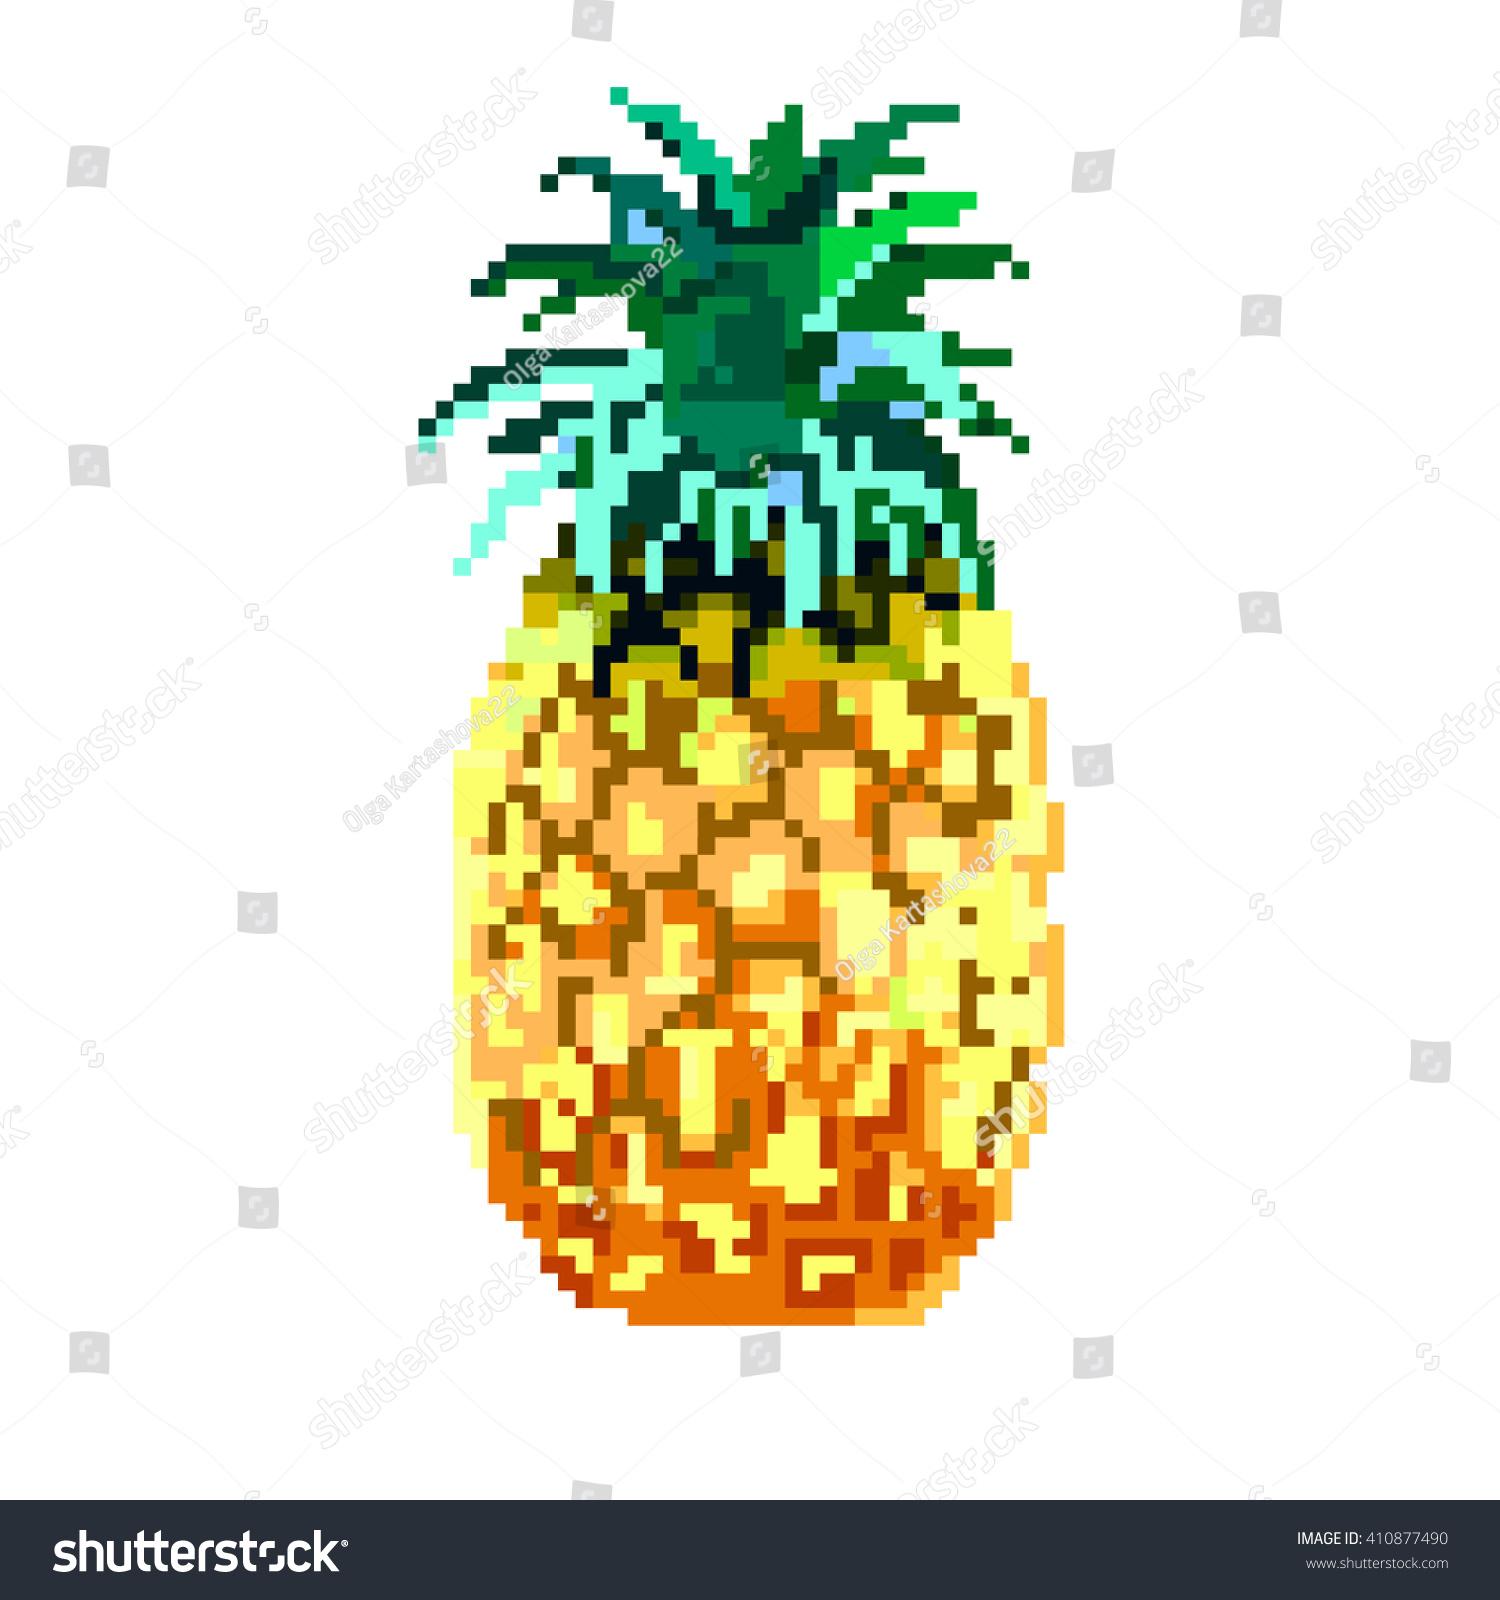 Pineapple Pixel Image Pixel Pineapple Stock Photo